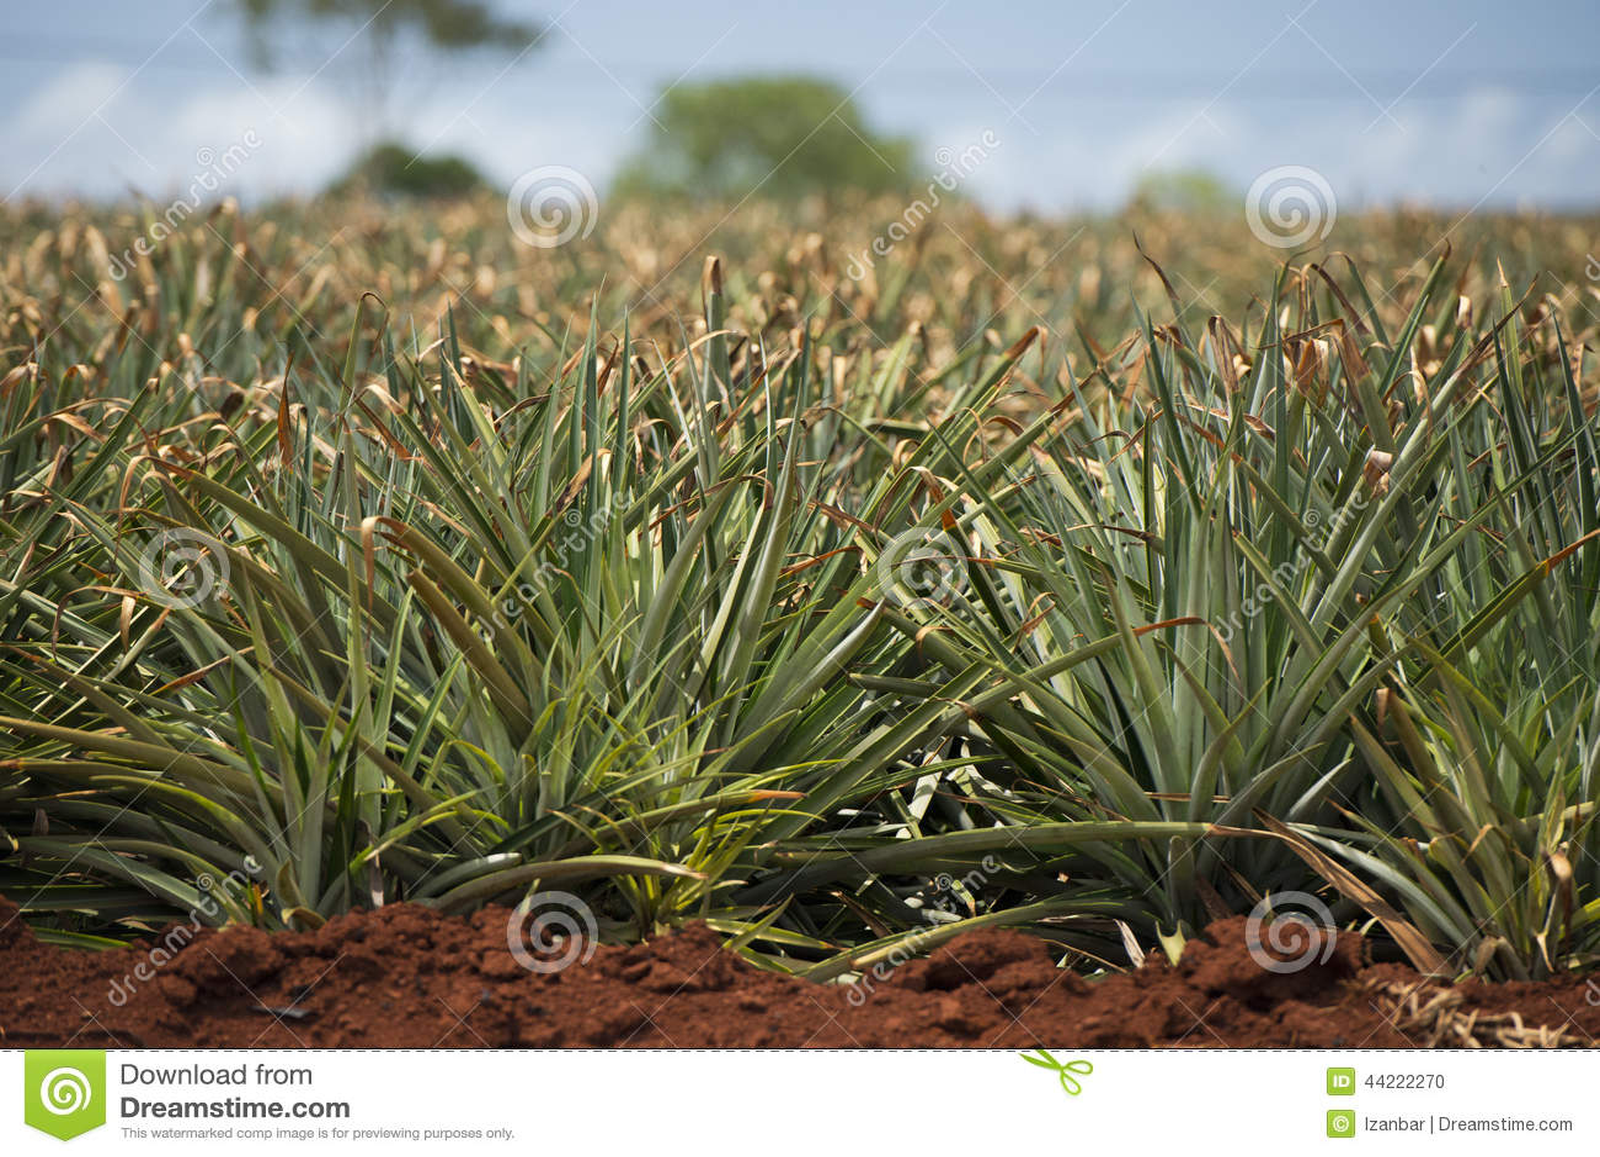 ananasplantage in hawaii stockfoto bild von himmel hawaii 44222270. Black Bedroom Furniture Sets. Home Design Ideas